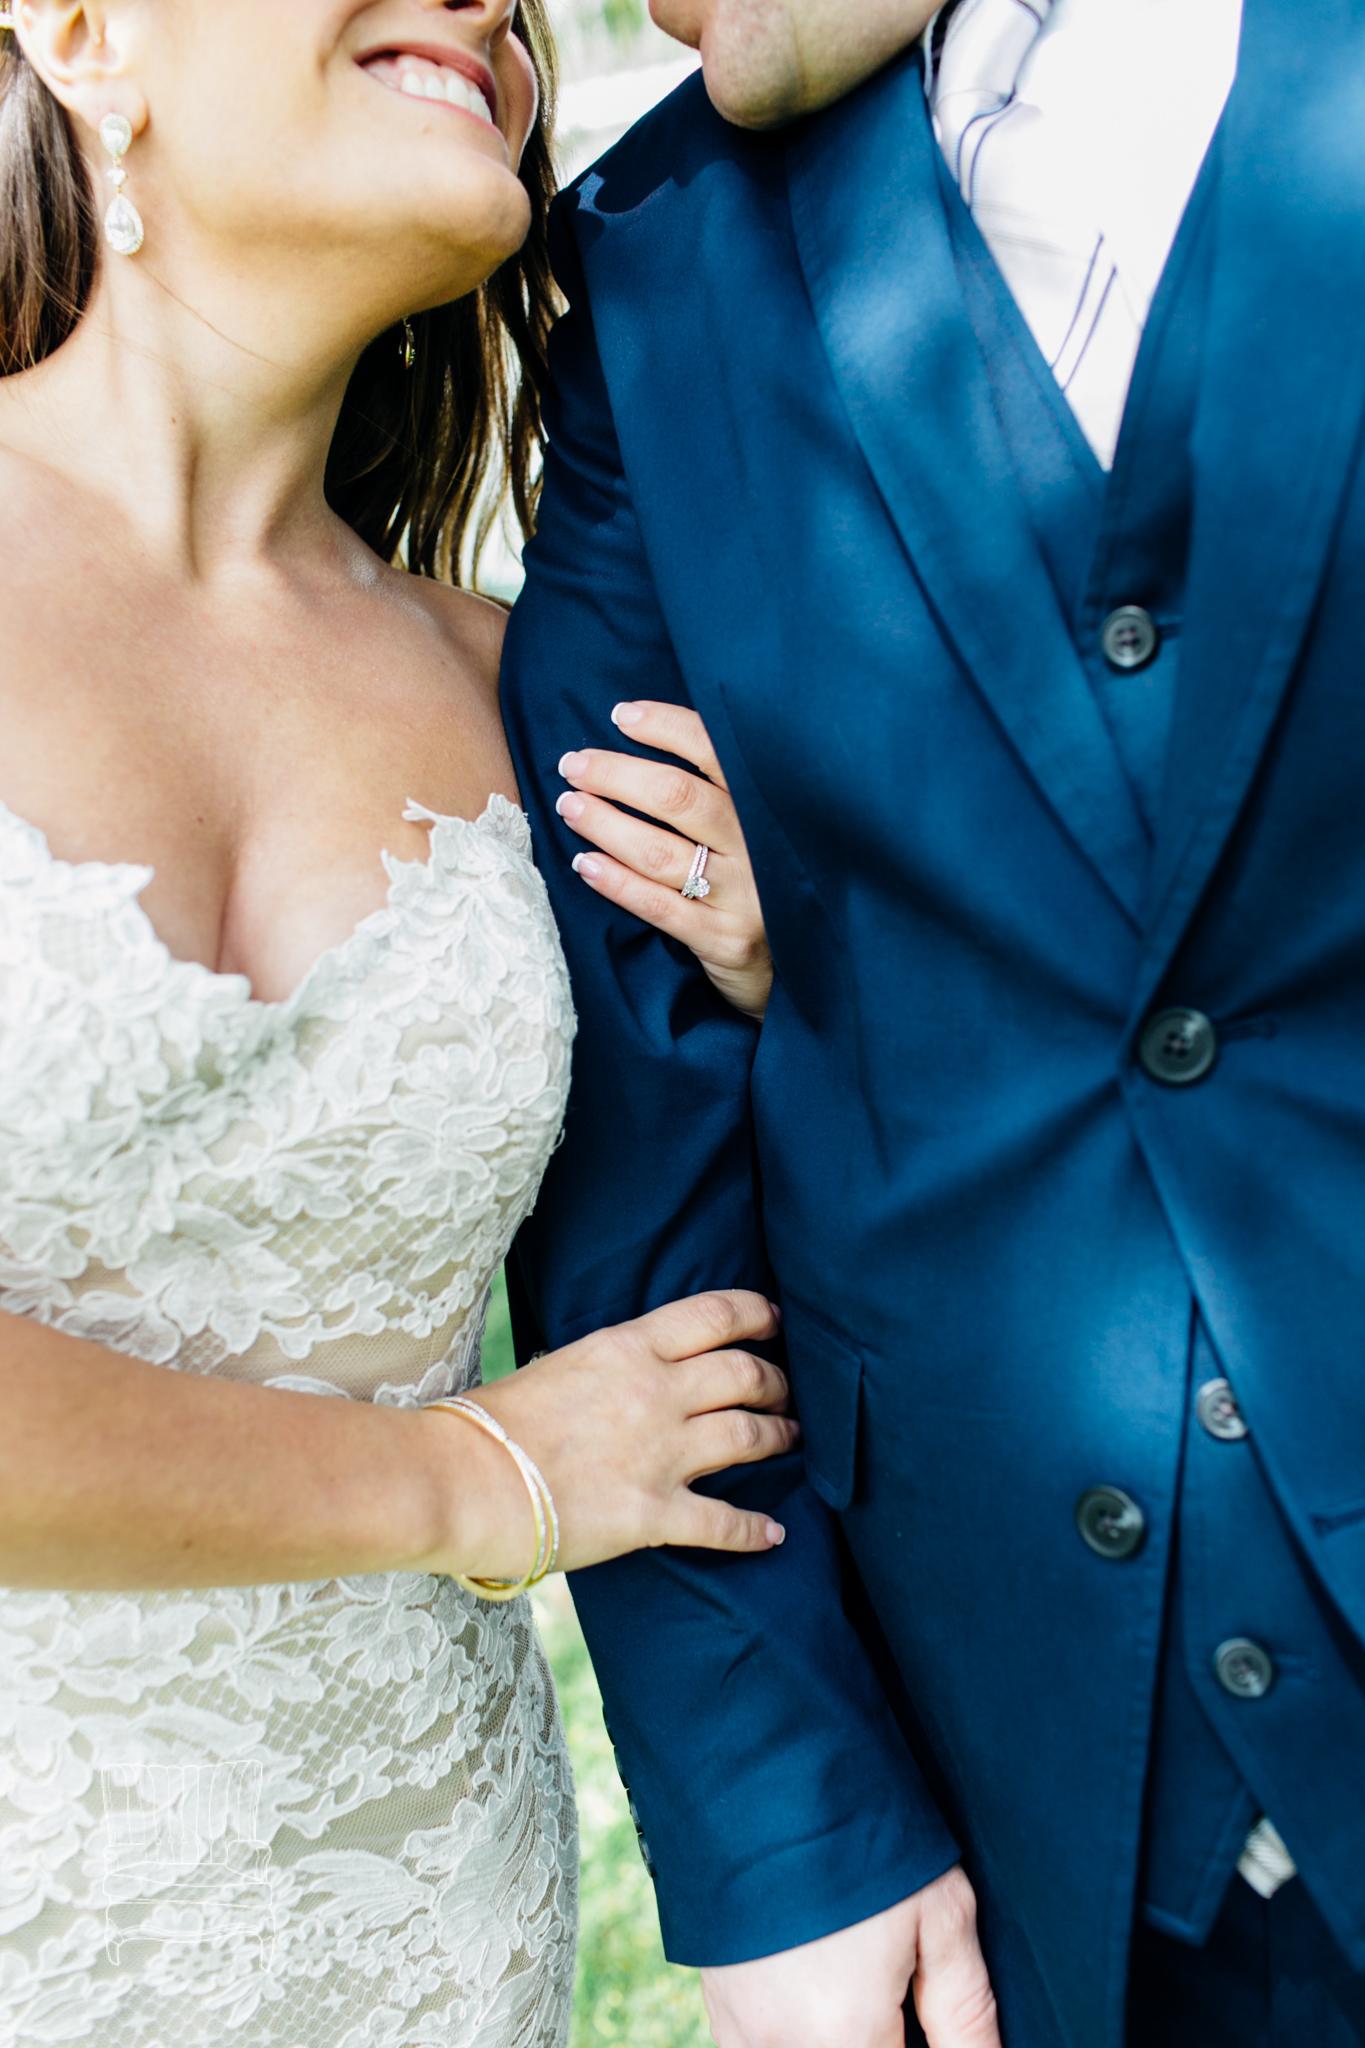 seattle-wedding-photographer-katheryn-moran-russells-bothell-wilkins-wedding-photo-26.jpg